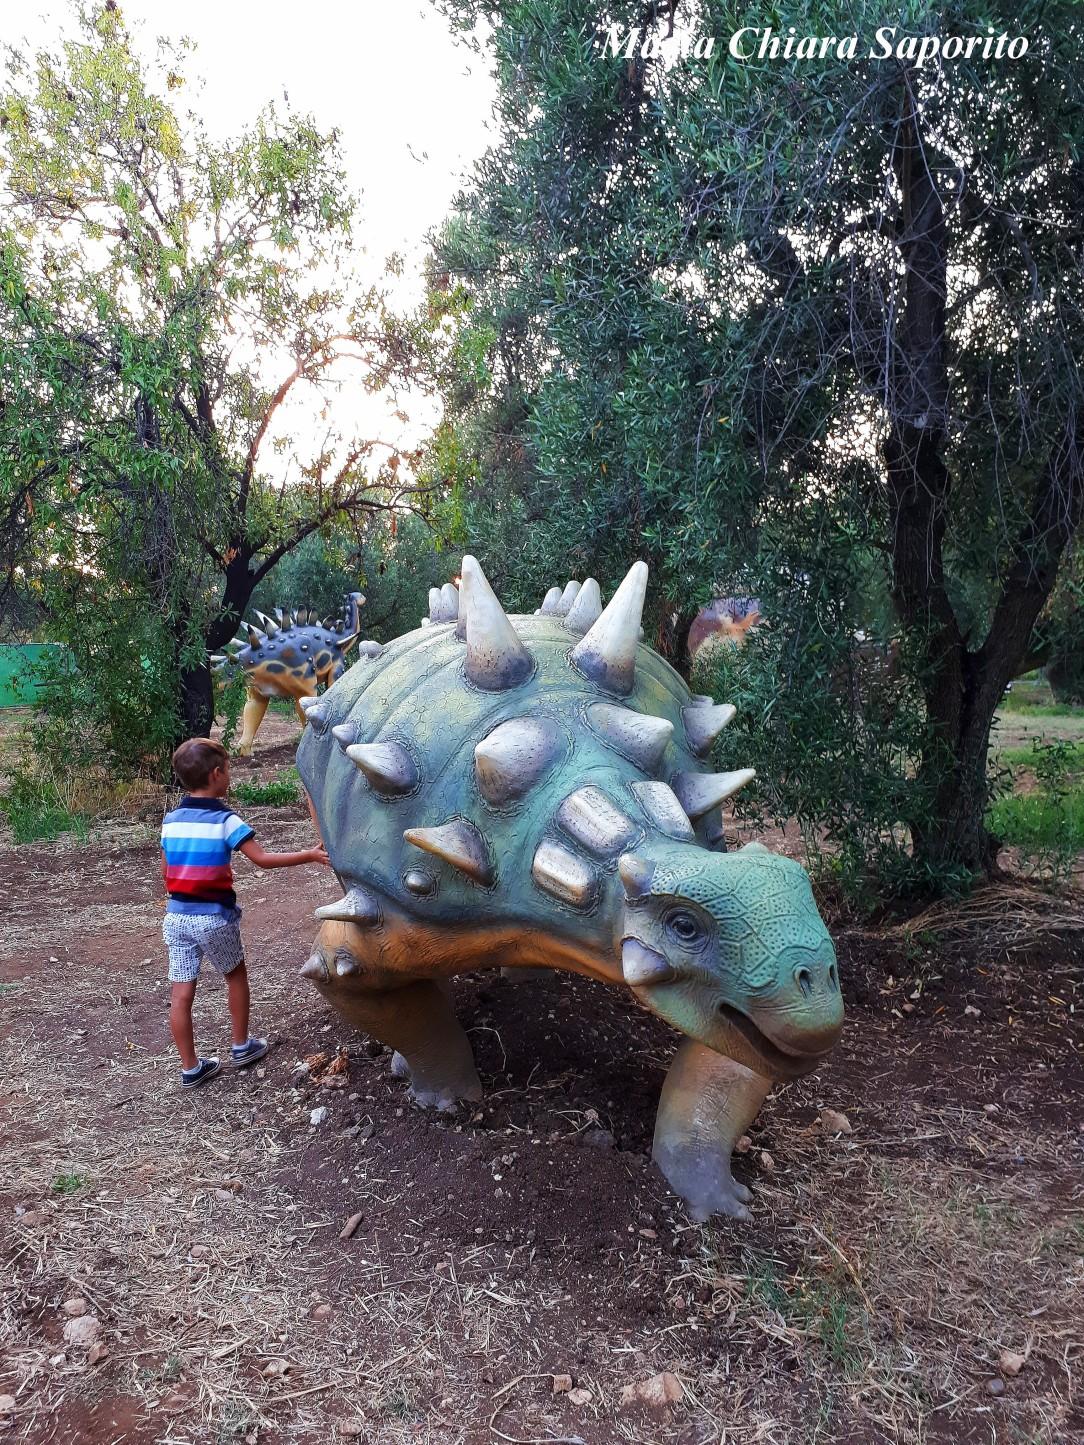 Jurassic World a Vieste World of Dinosaurs